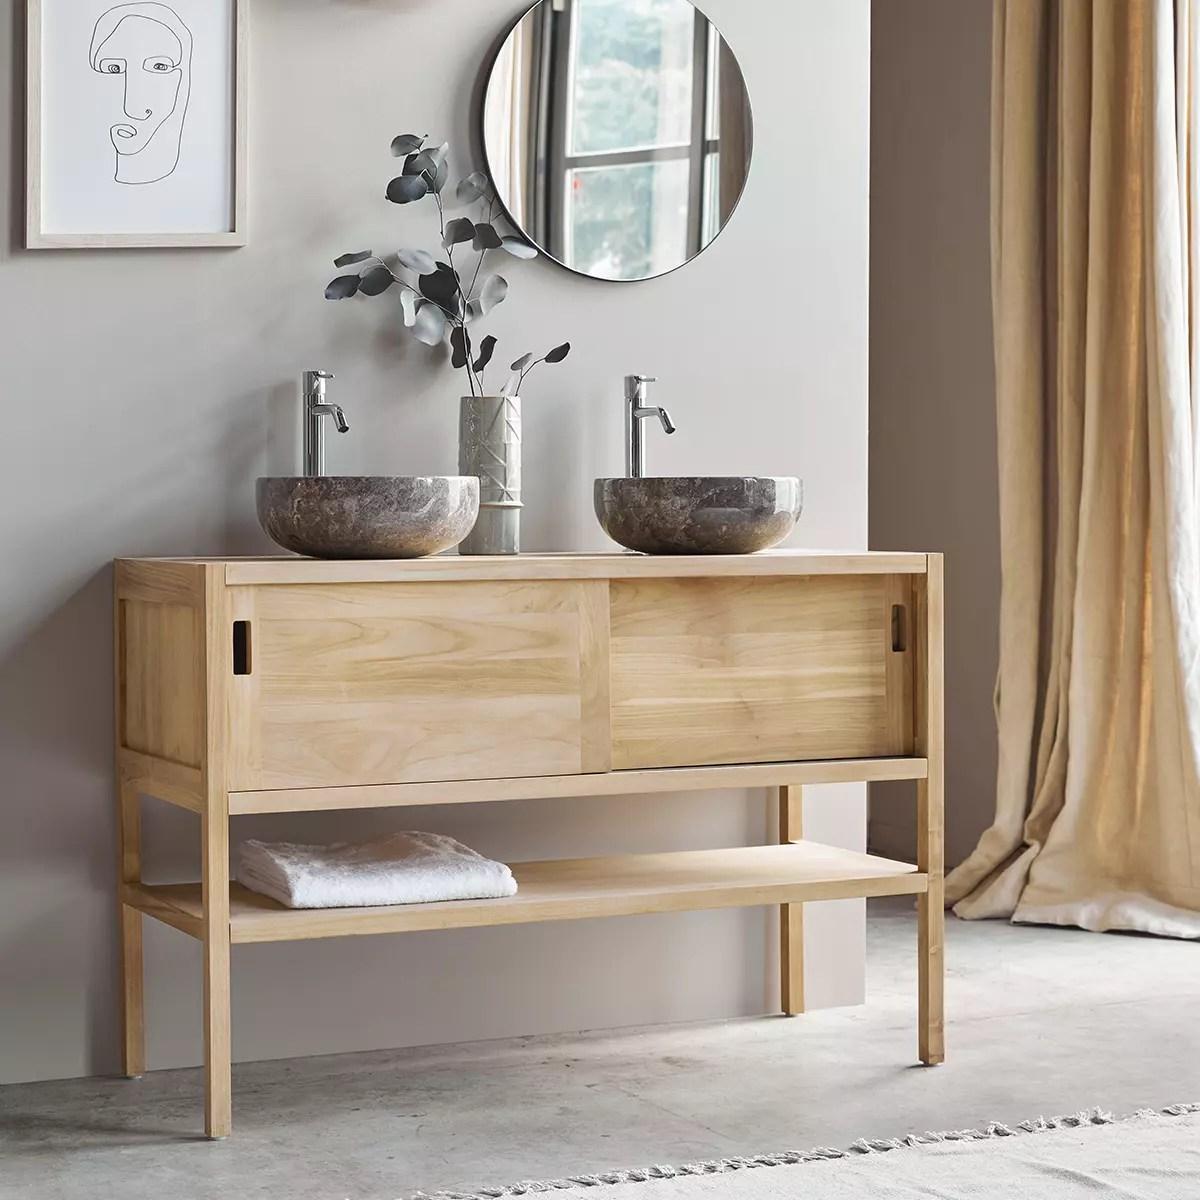 meuble salle de bain en teck massif brut 120 arty